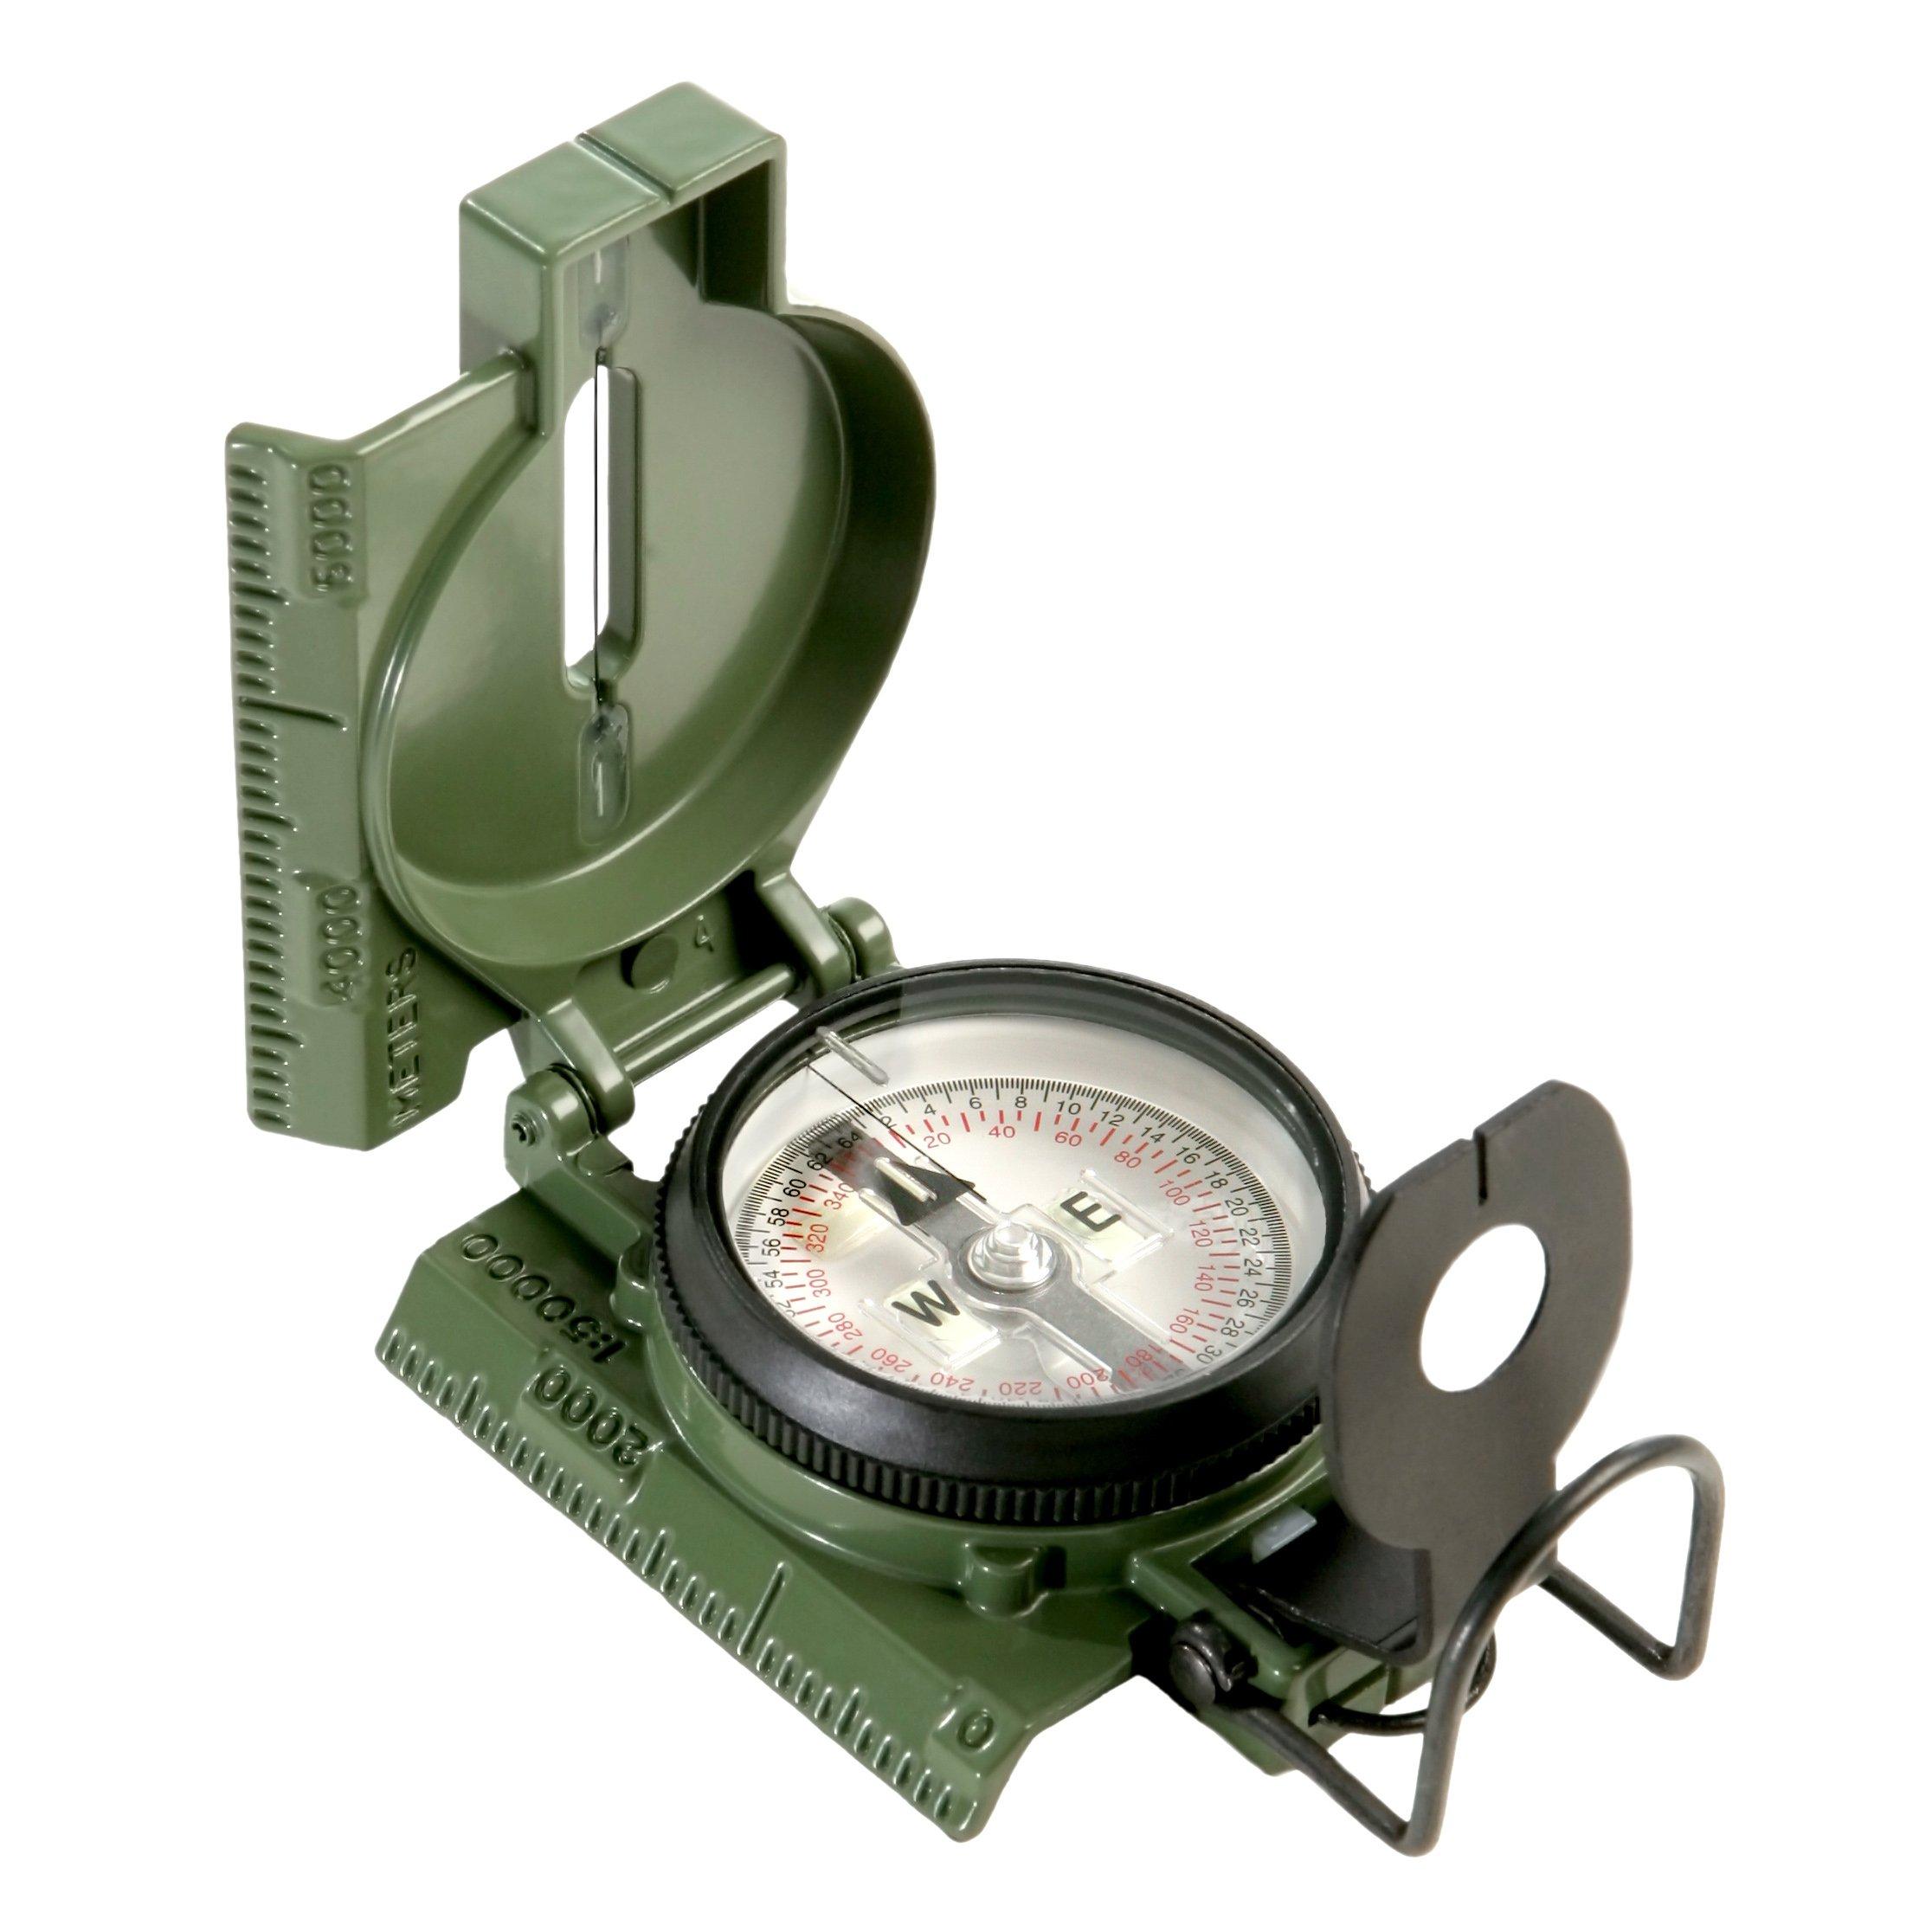 Cammenga Official US Miltary Tritium Lensatic Compass, Clam Pack